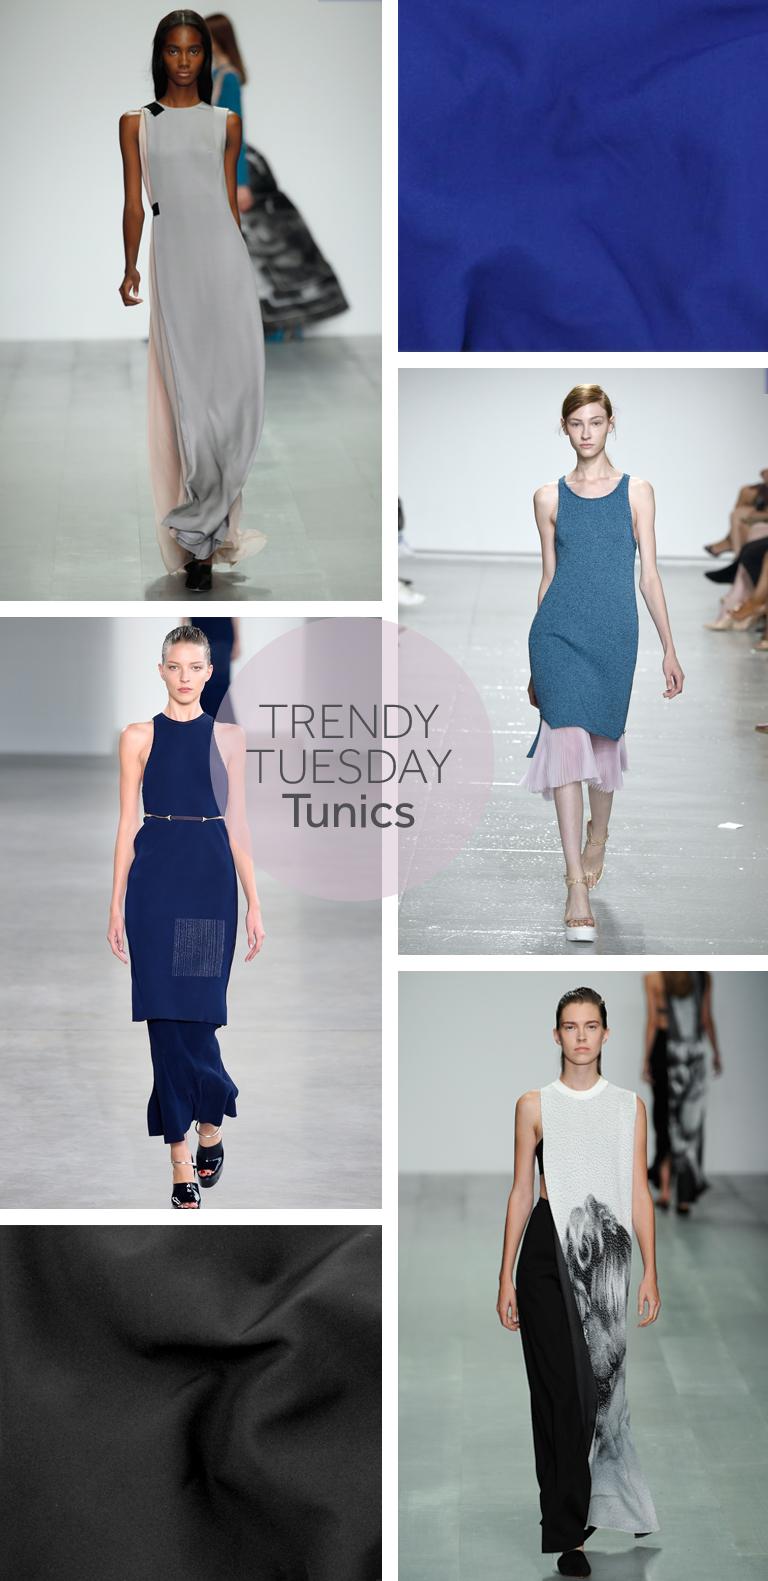 trendy-tuesday-tunics-fashion-trend